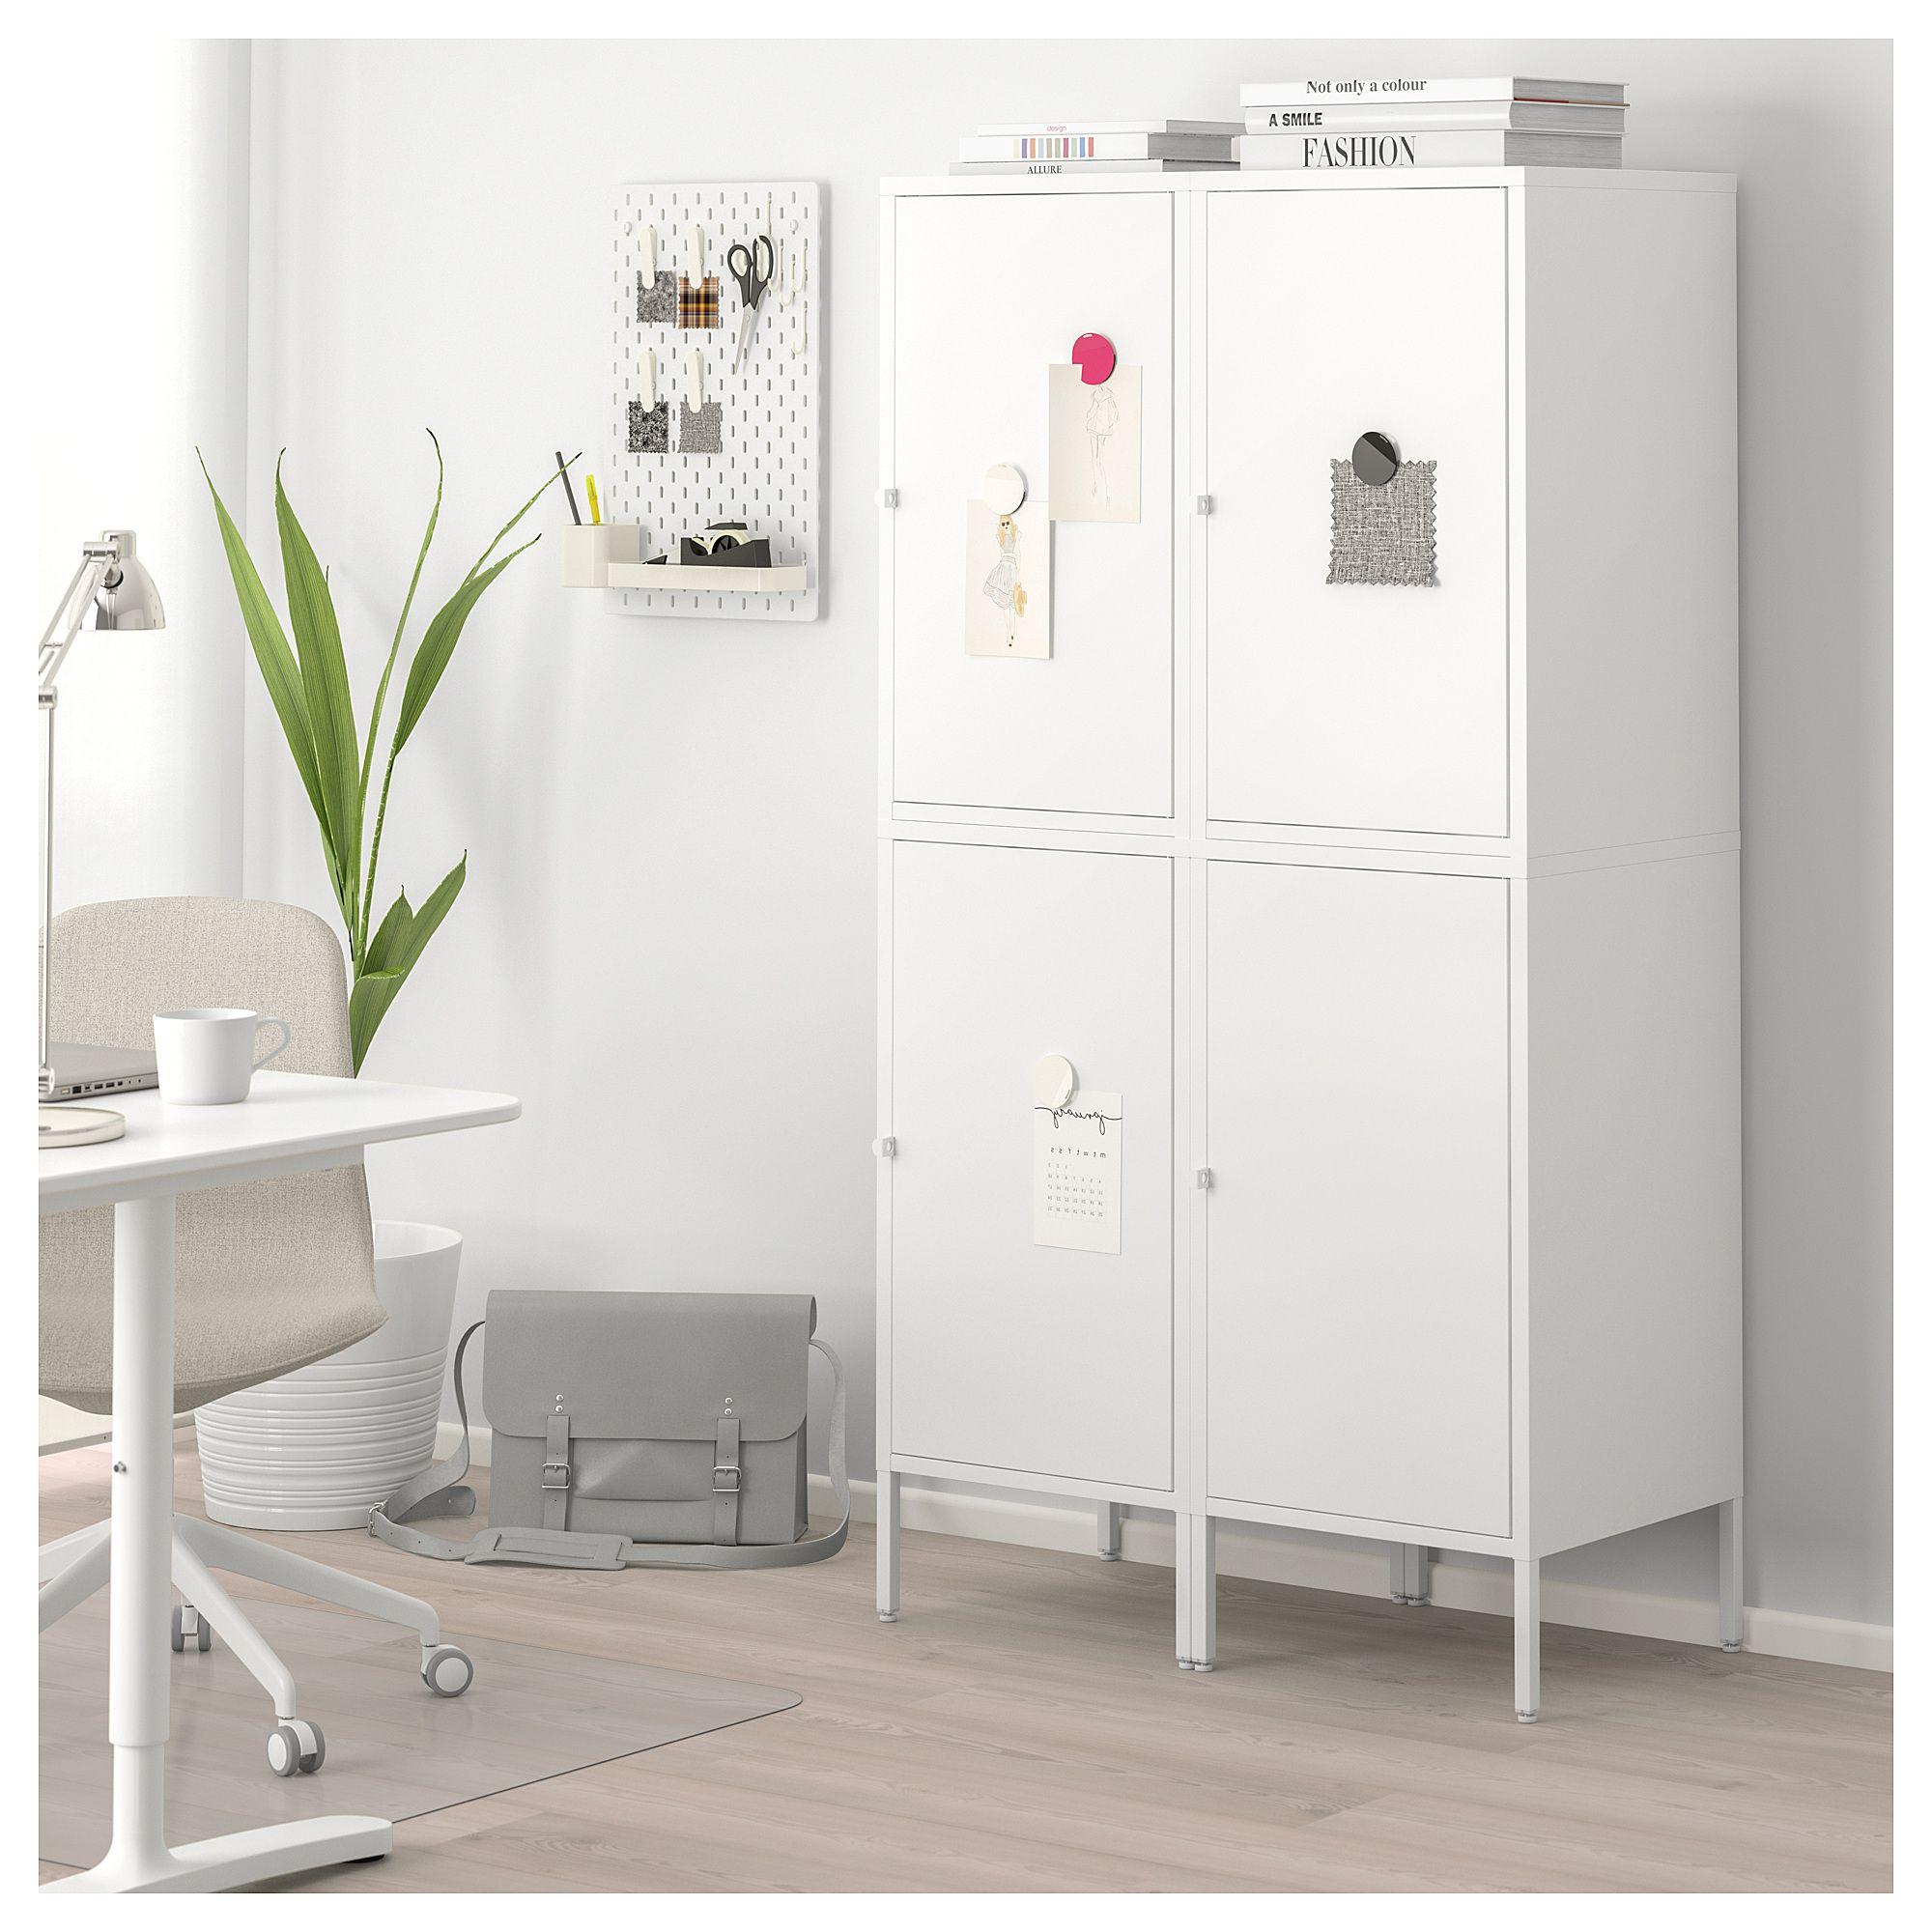 Hallan Storage Combination With Doors White 35 3 8x18 1 2x65 3 4